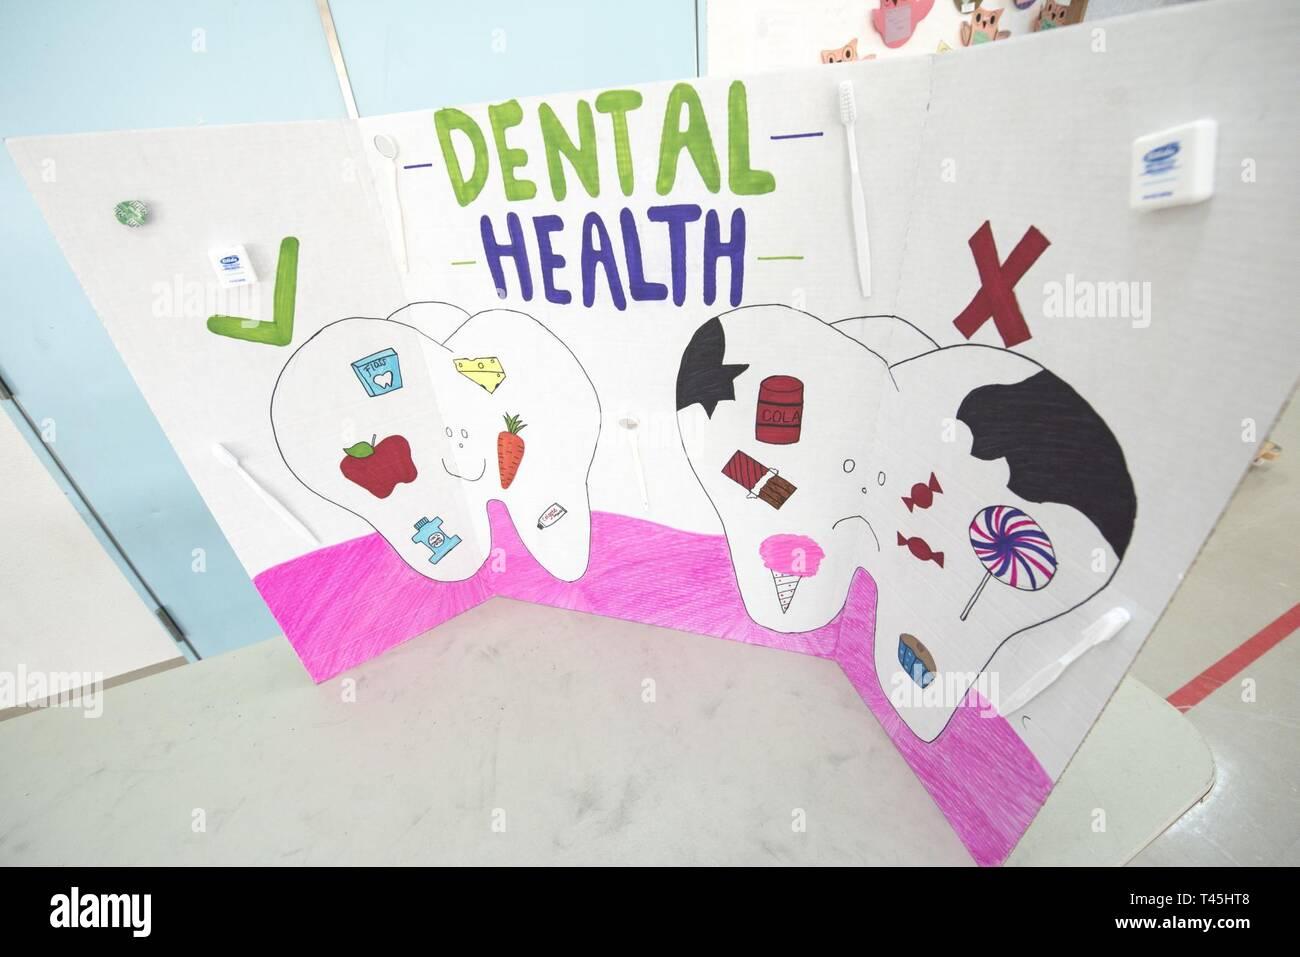 The 35th Dental Squadron displays a dental health board